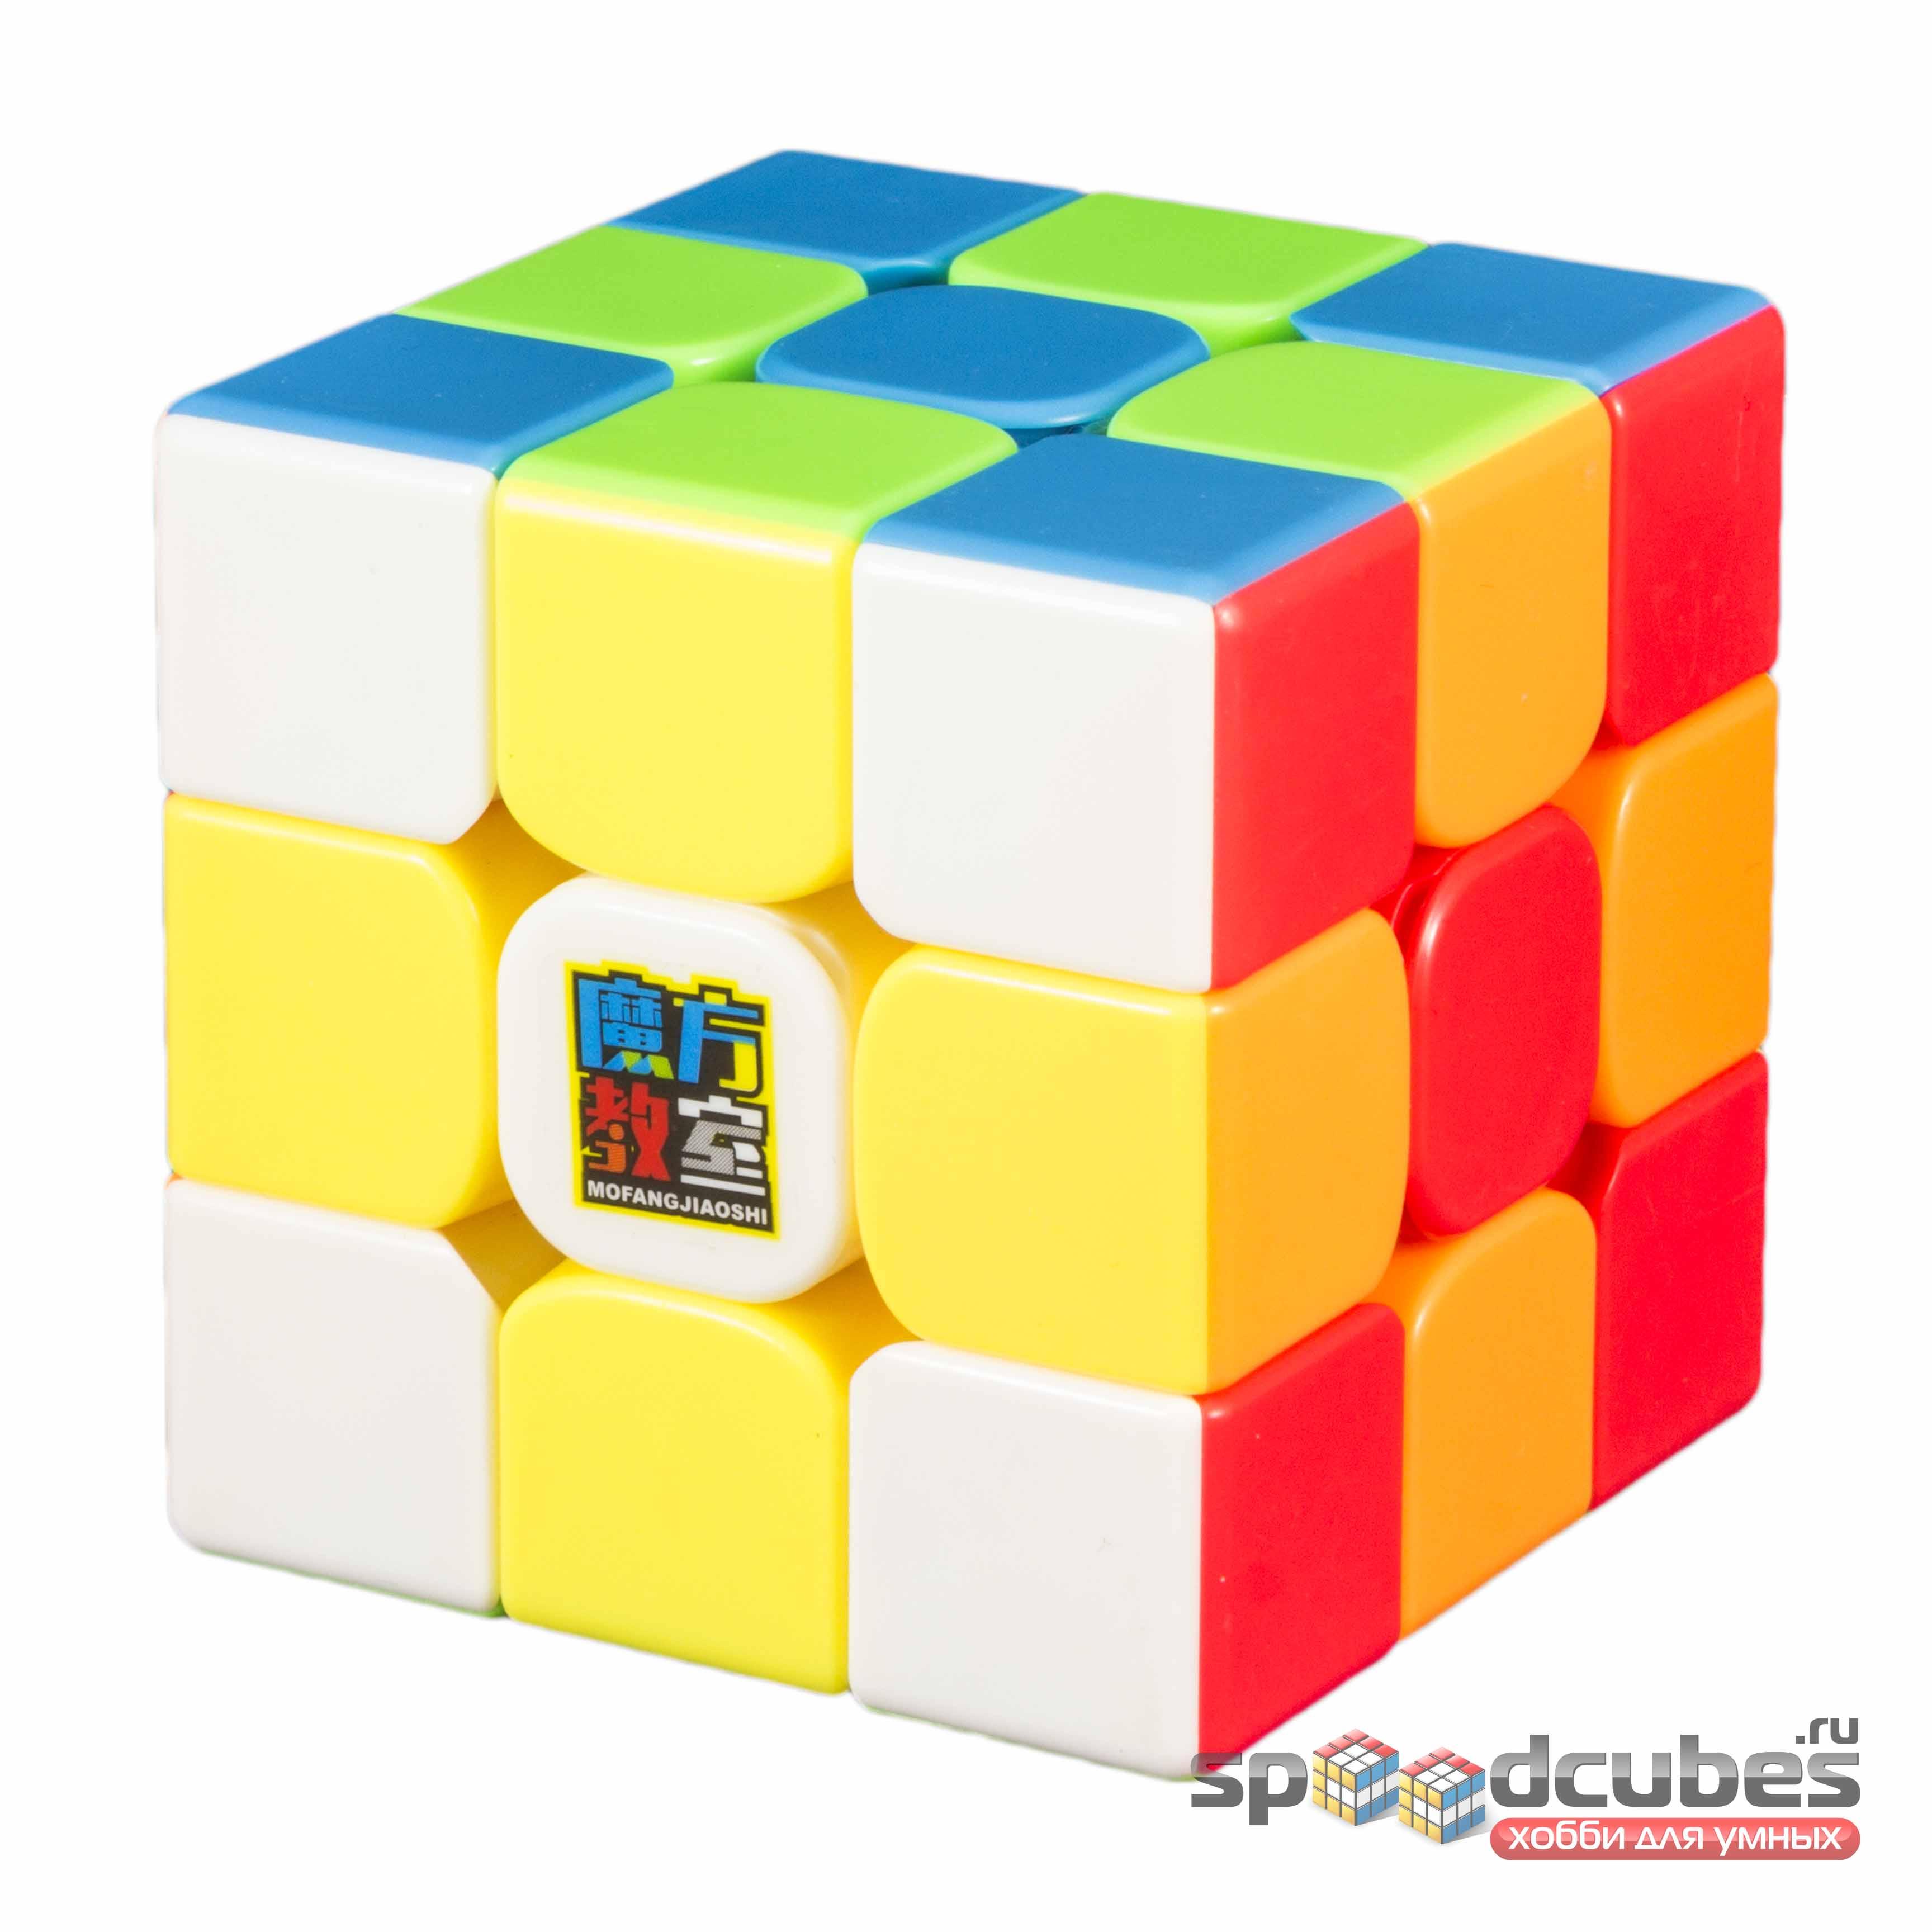 MoYu Cubing Classroom (набор Moyu MF2s, MF3rs, MF4s, MF5s) 4